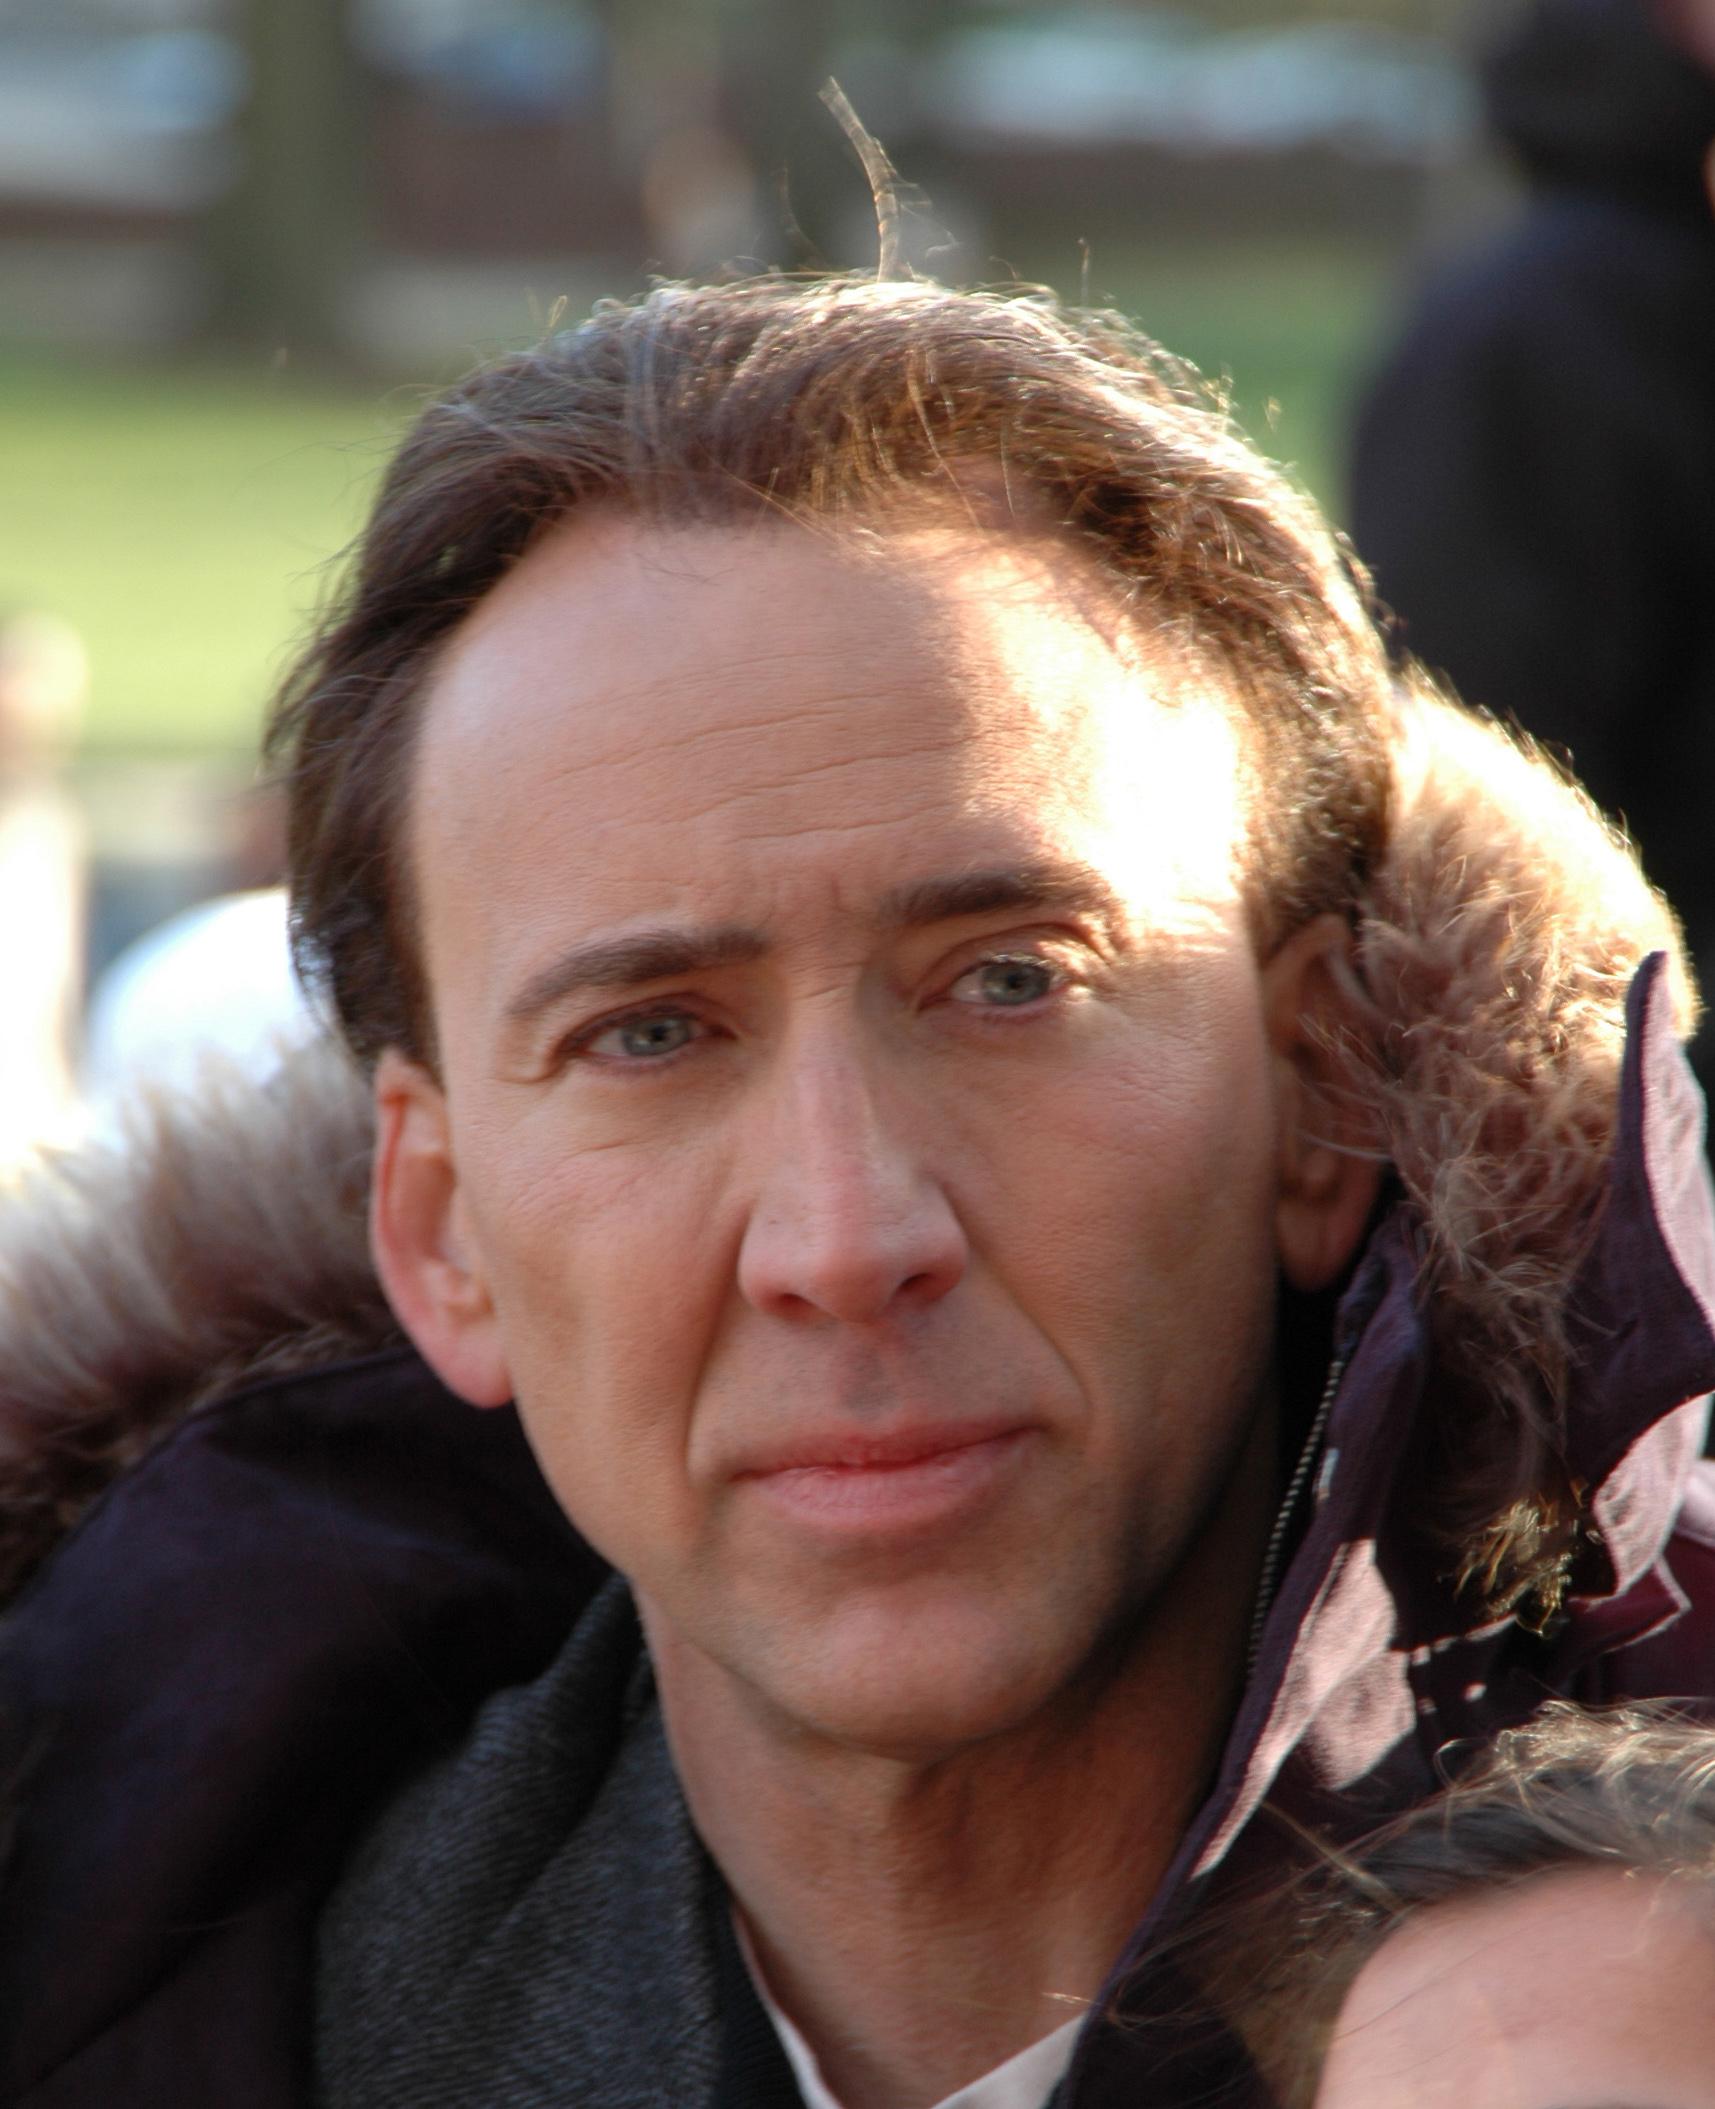 Nicholas Cage Award Winning Actor